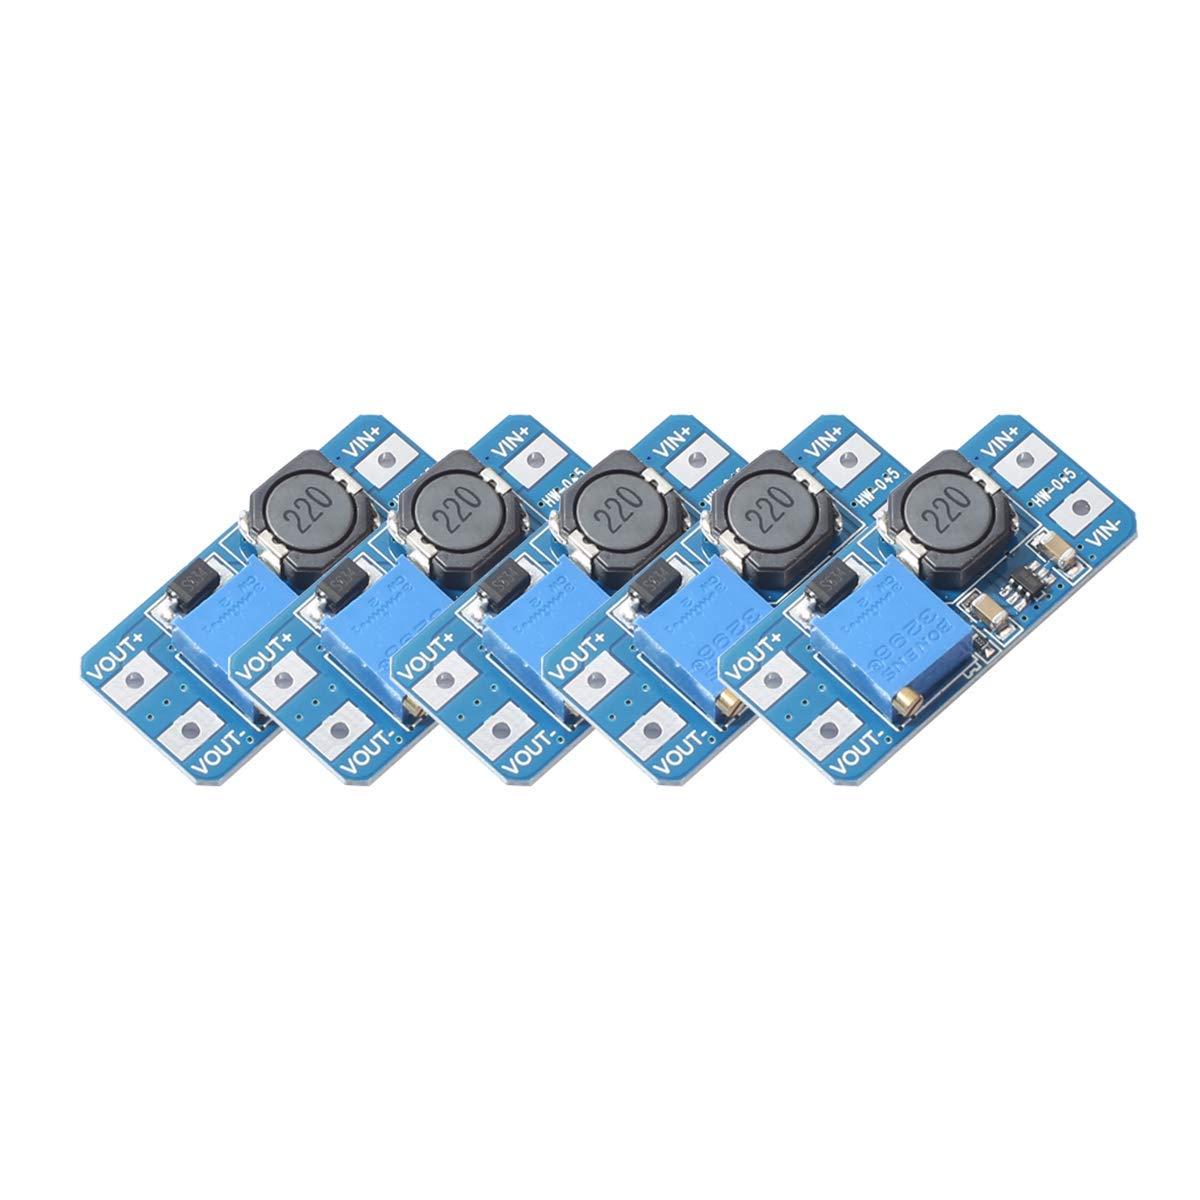 Converter Adjustable Voltage Regulator Arduino